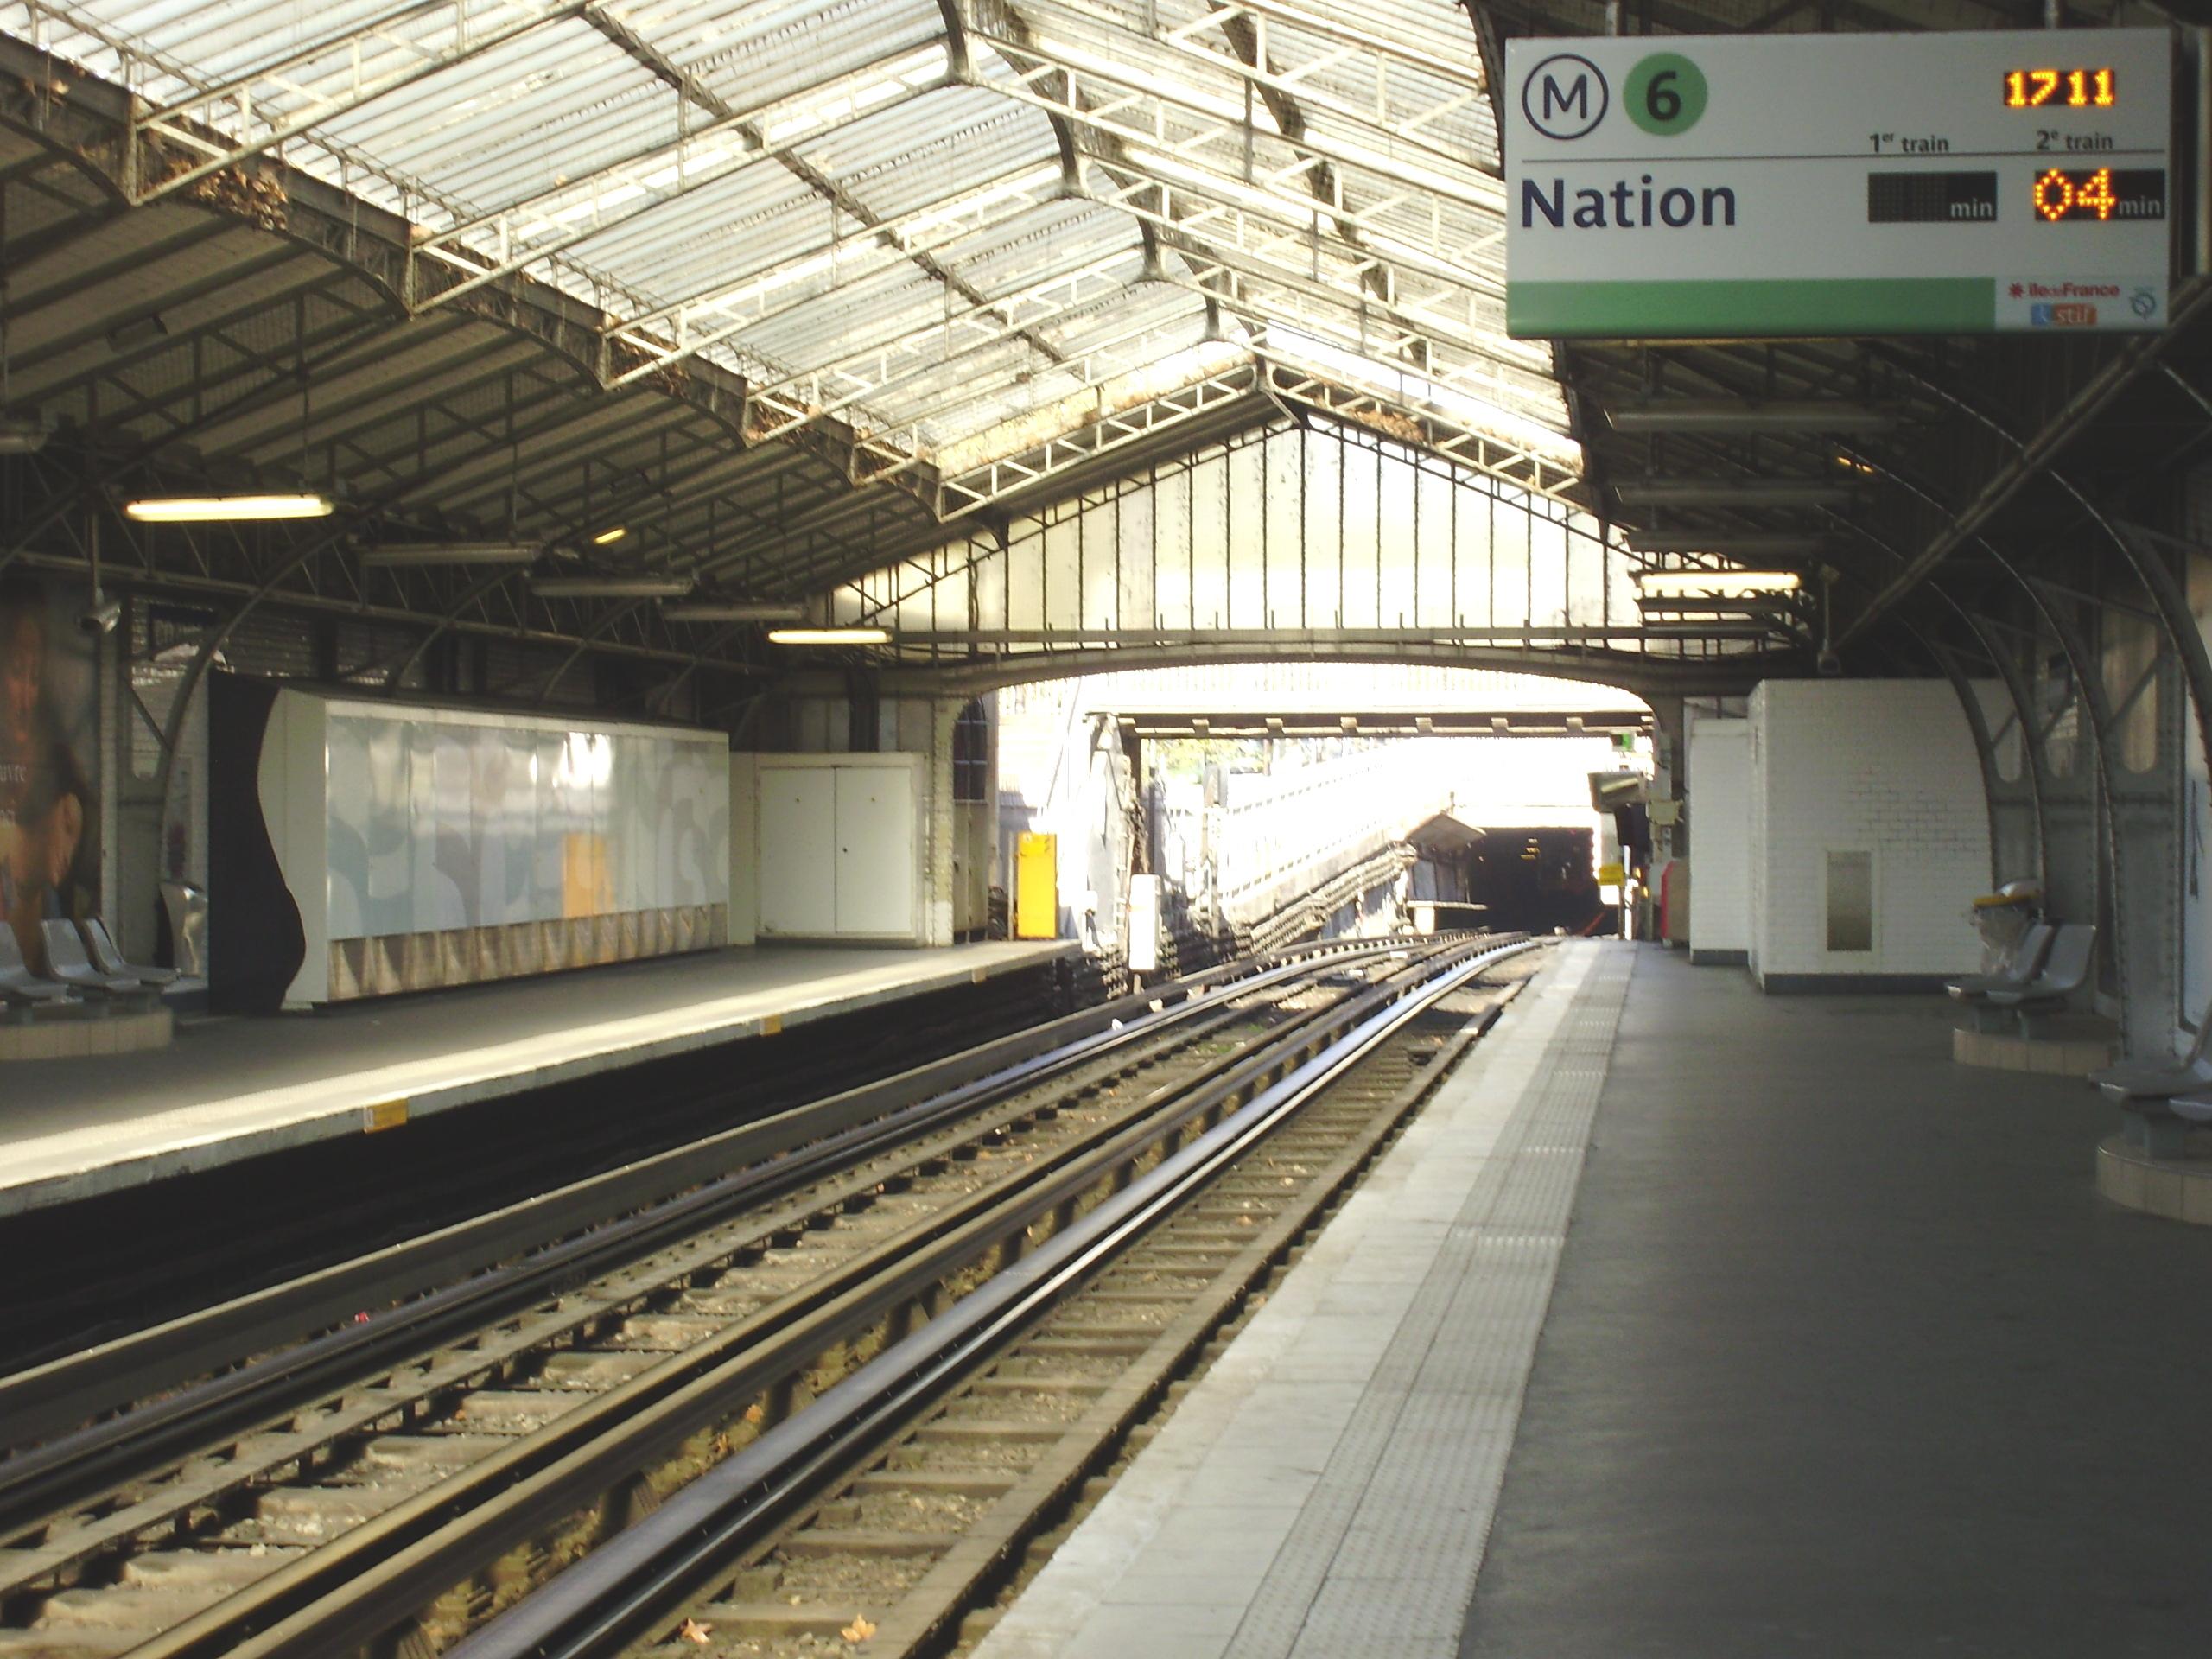 Corvisart (stanice metra v Paříži)